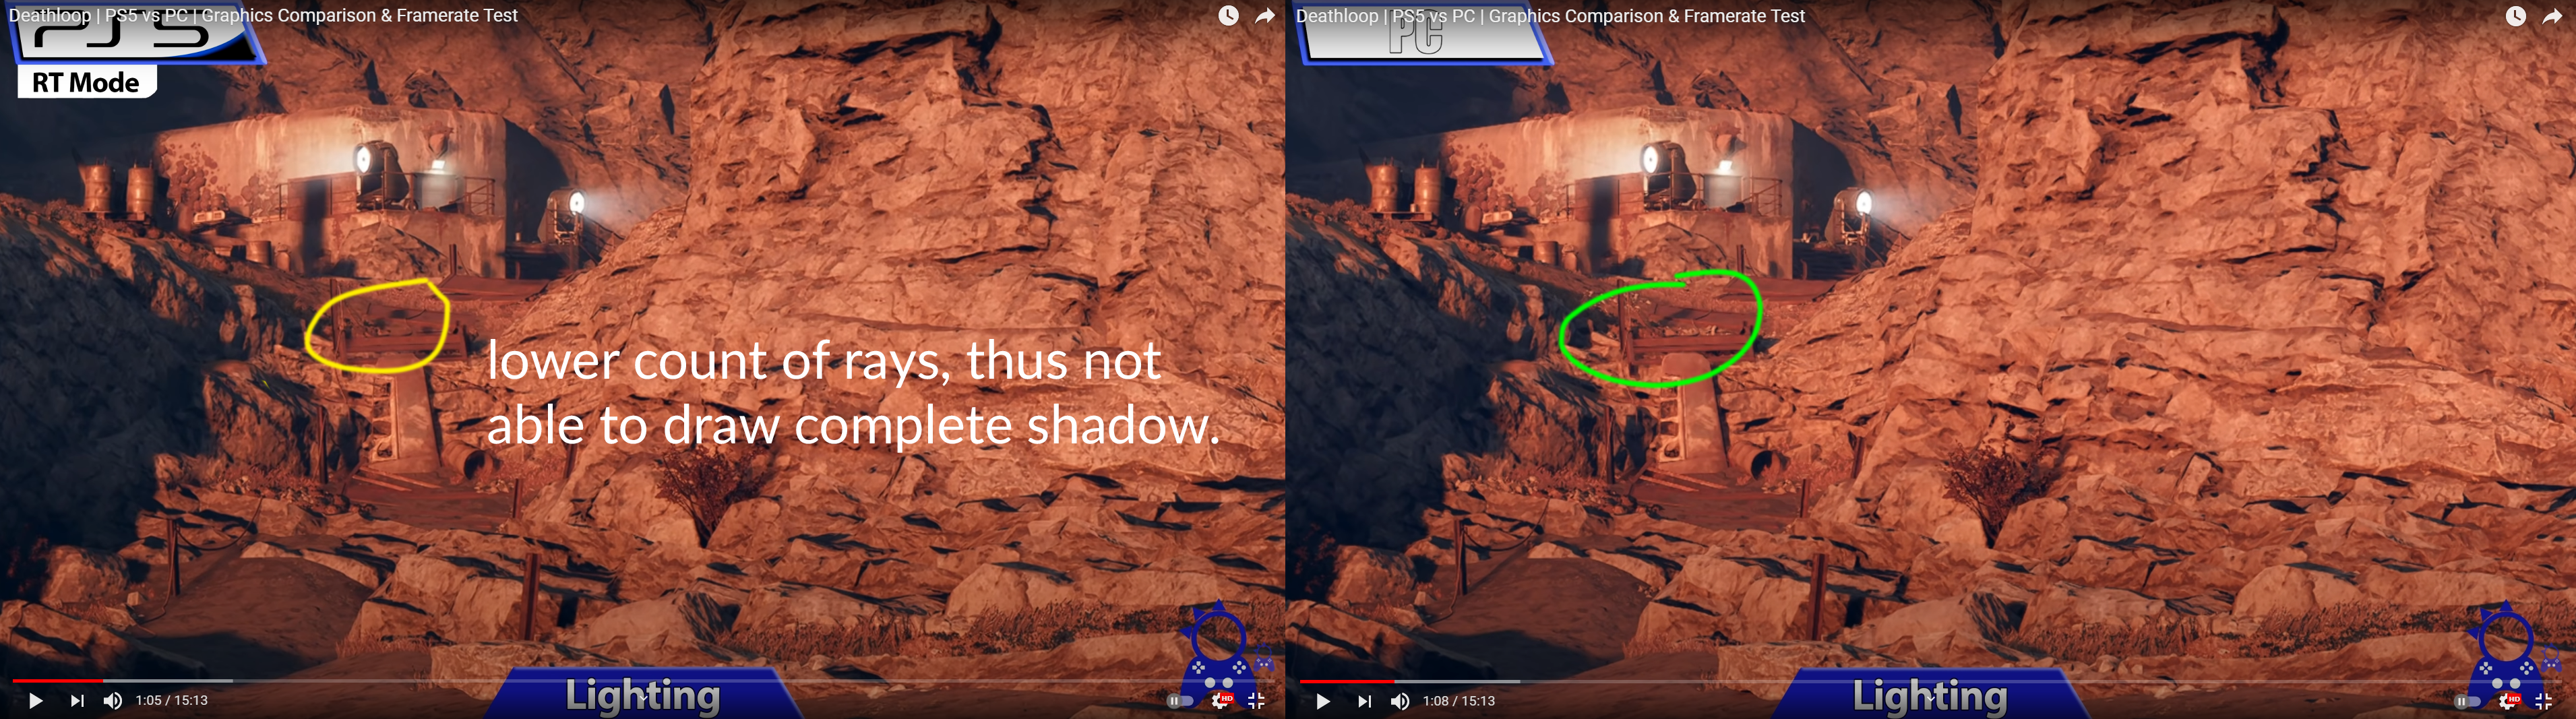 lol-shadow-2.png